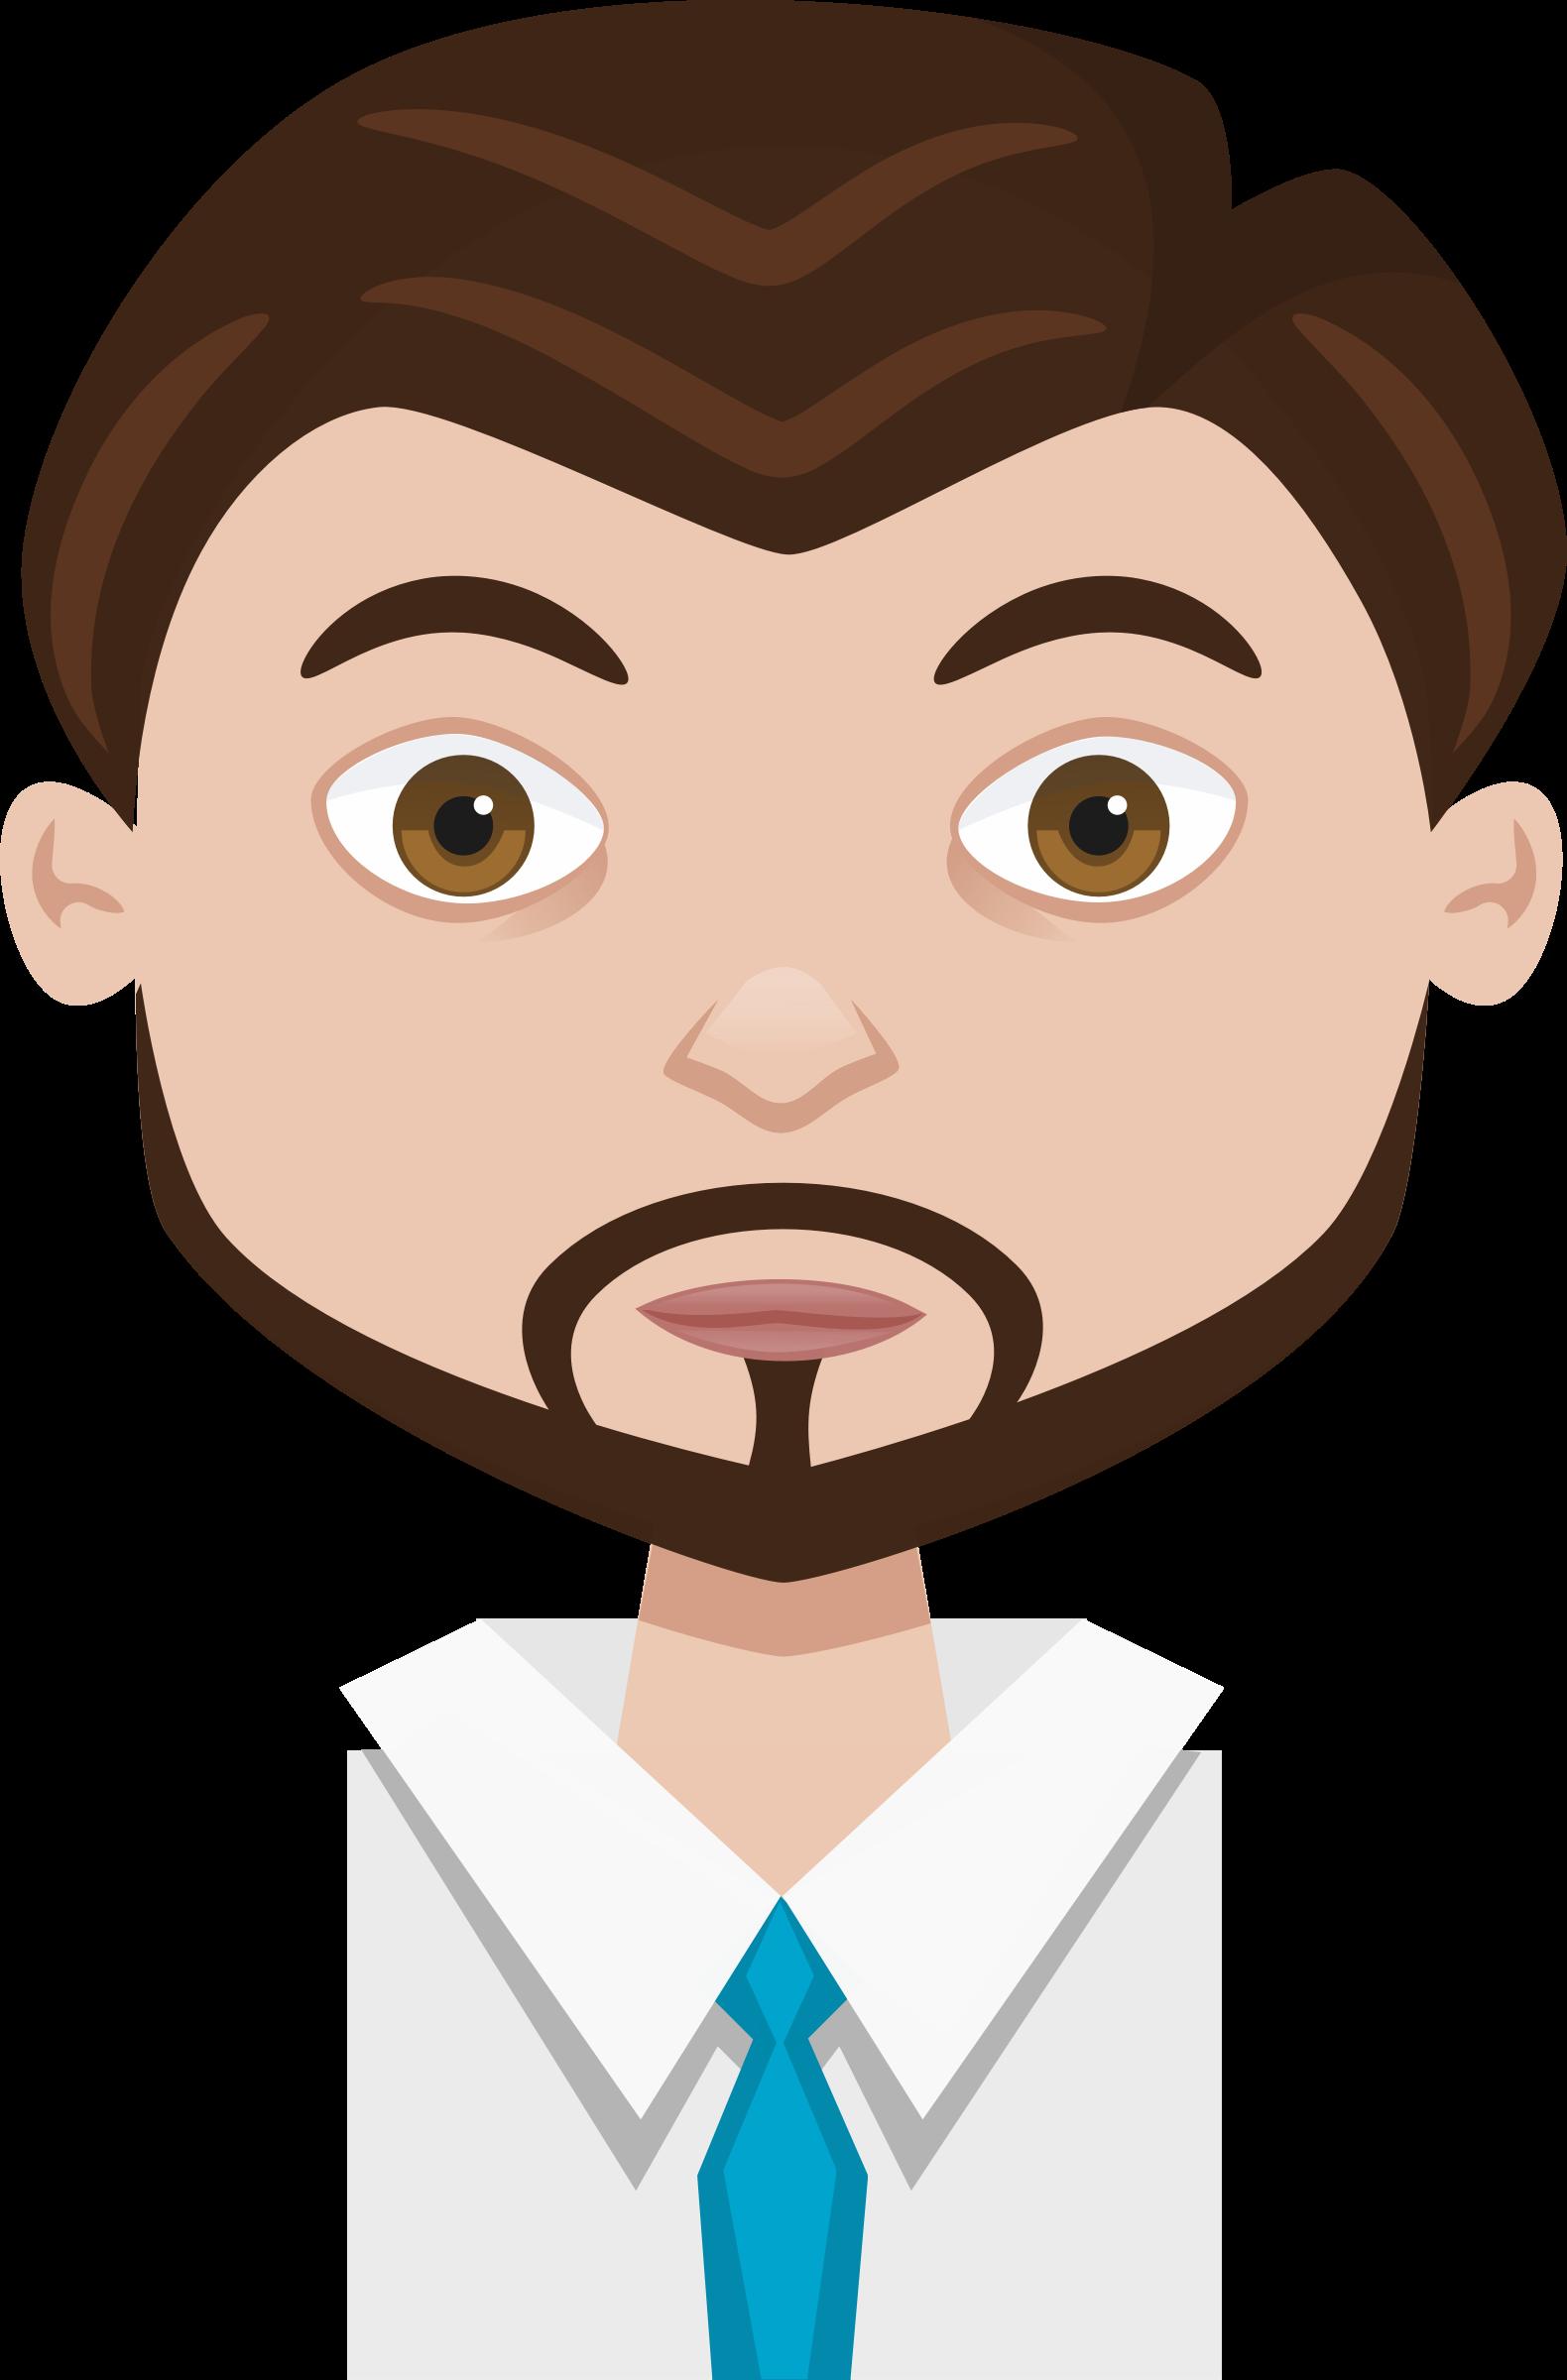 clipart freeuse Male cartoon avatar big. Beard clipart man profile